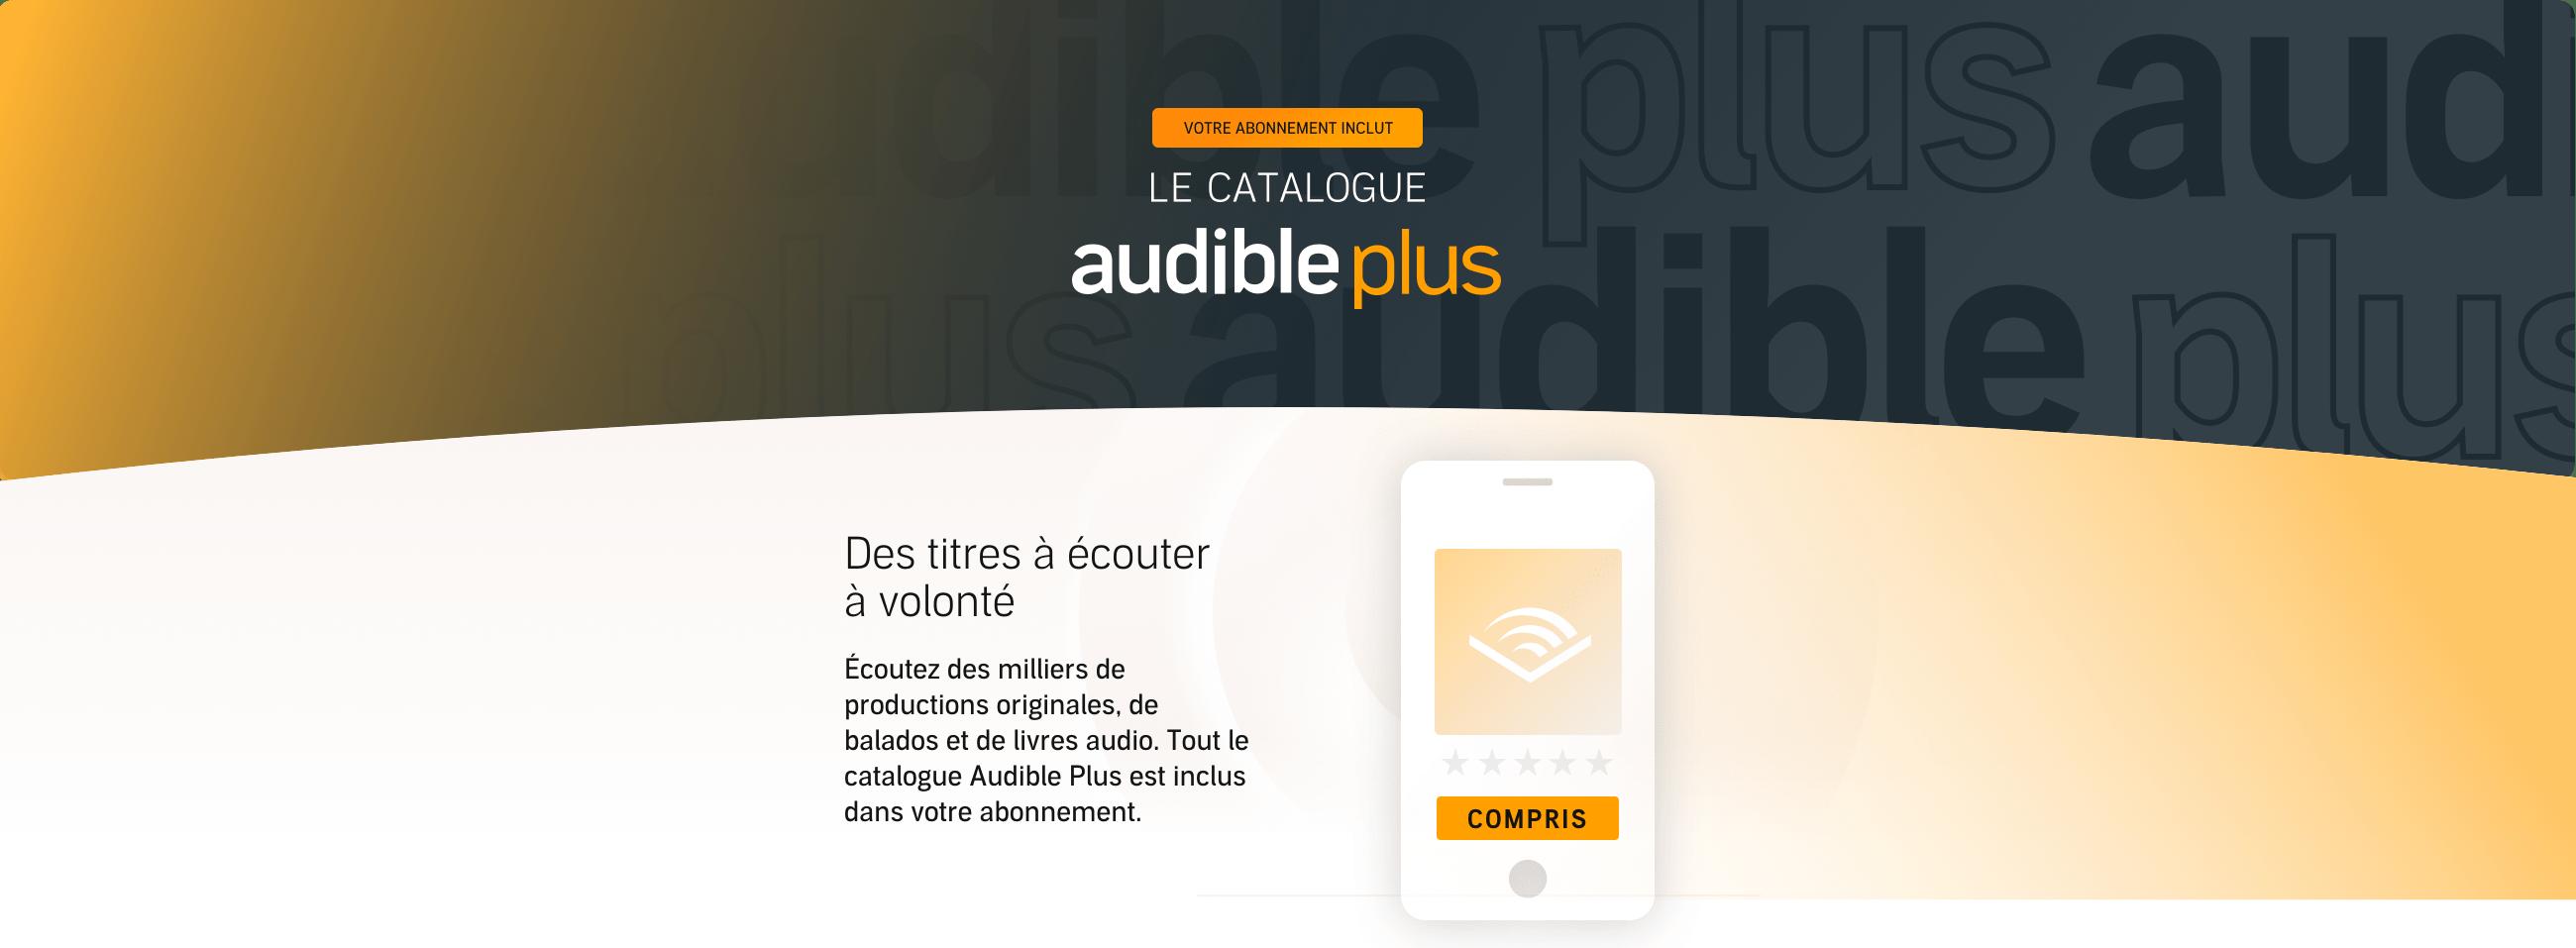 Audible Plus free trial